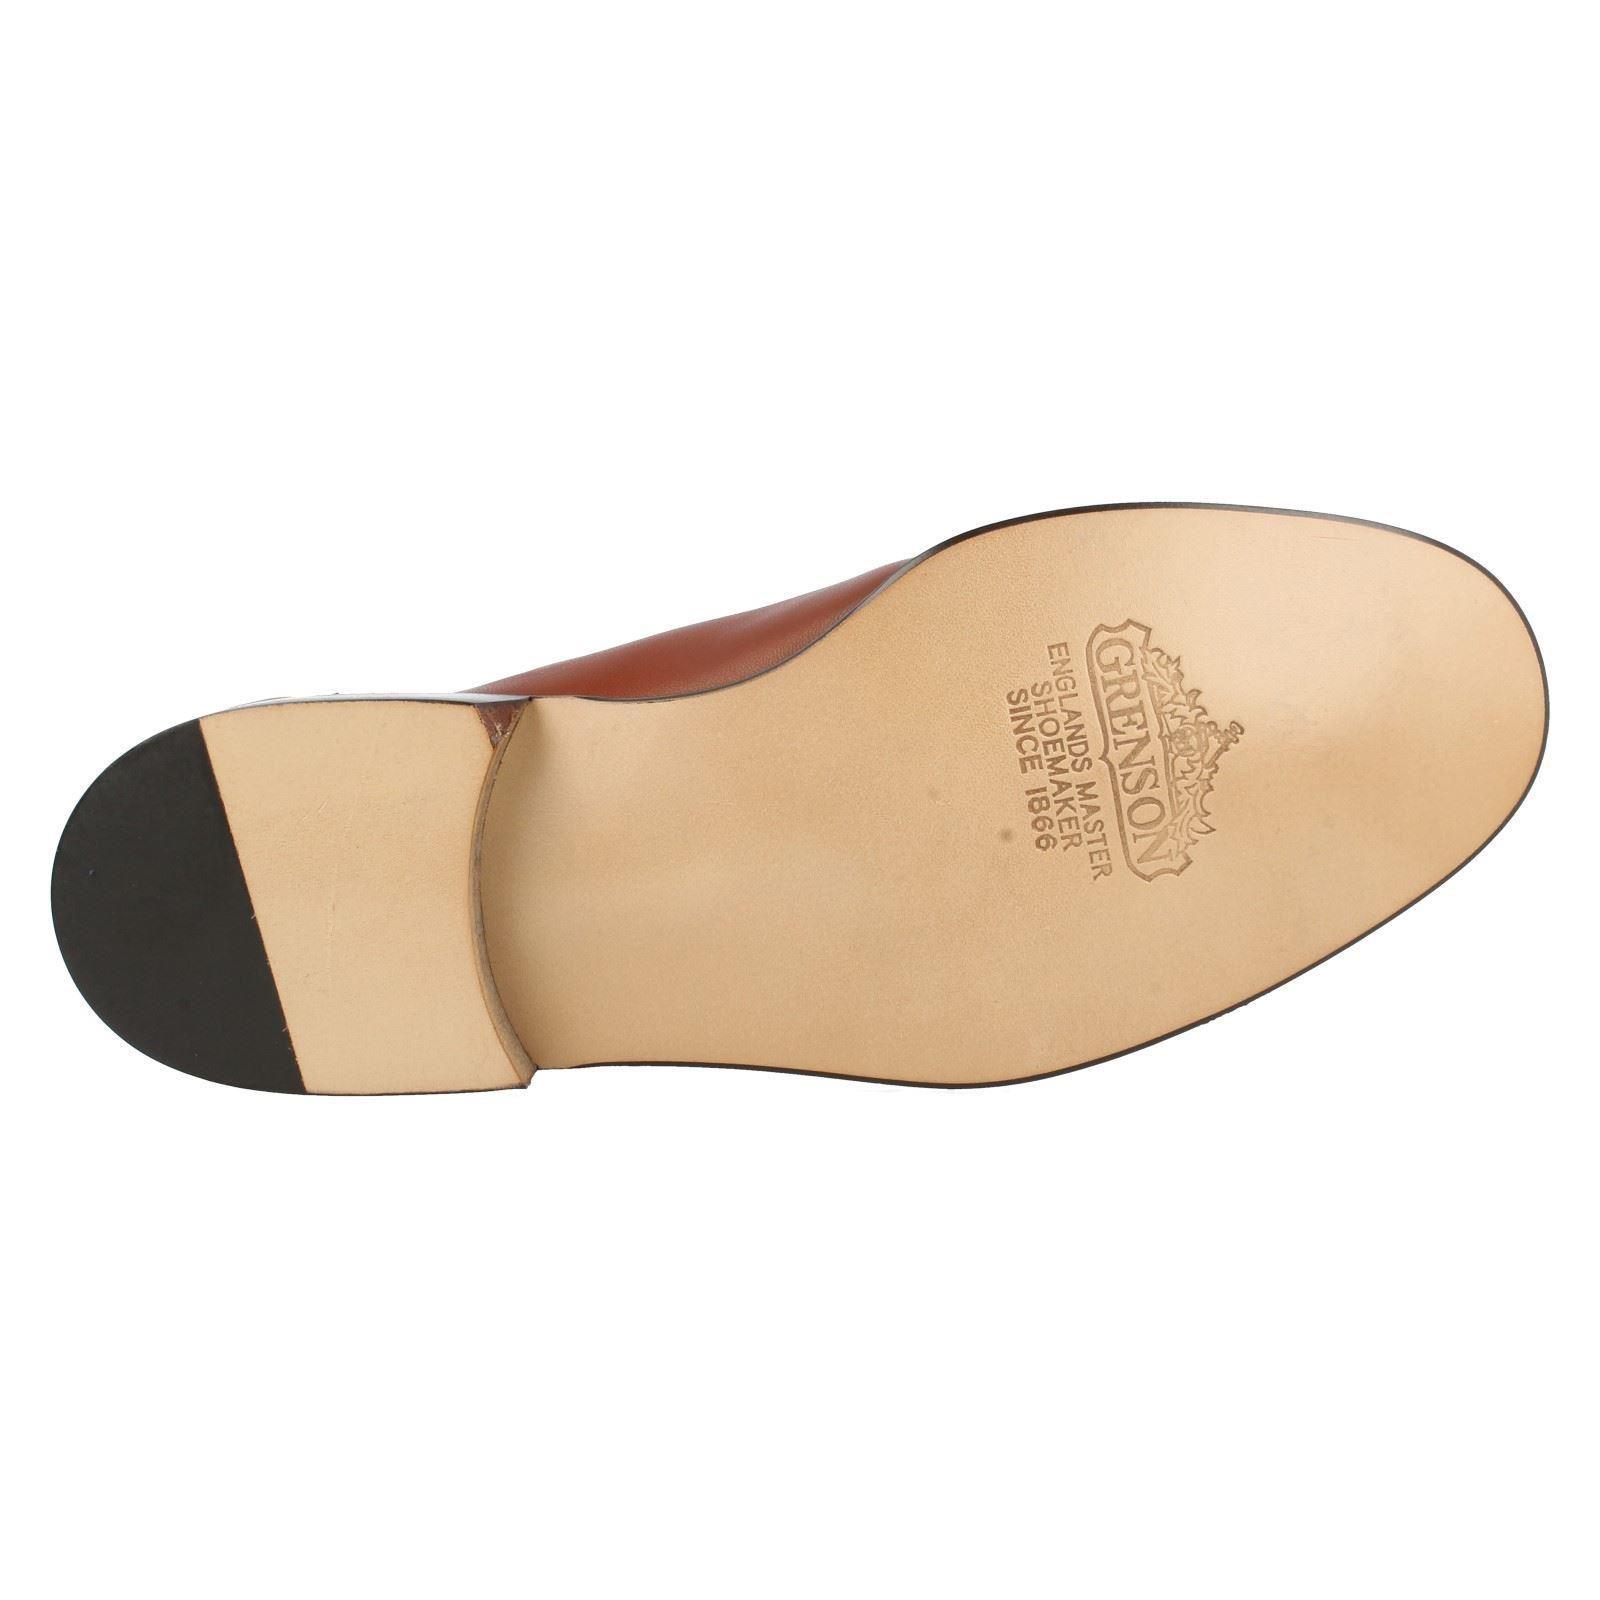 Mens Grenson True True True Moccasin Shoes Evan Label 9646 267e48